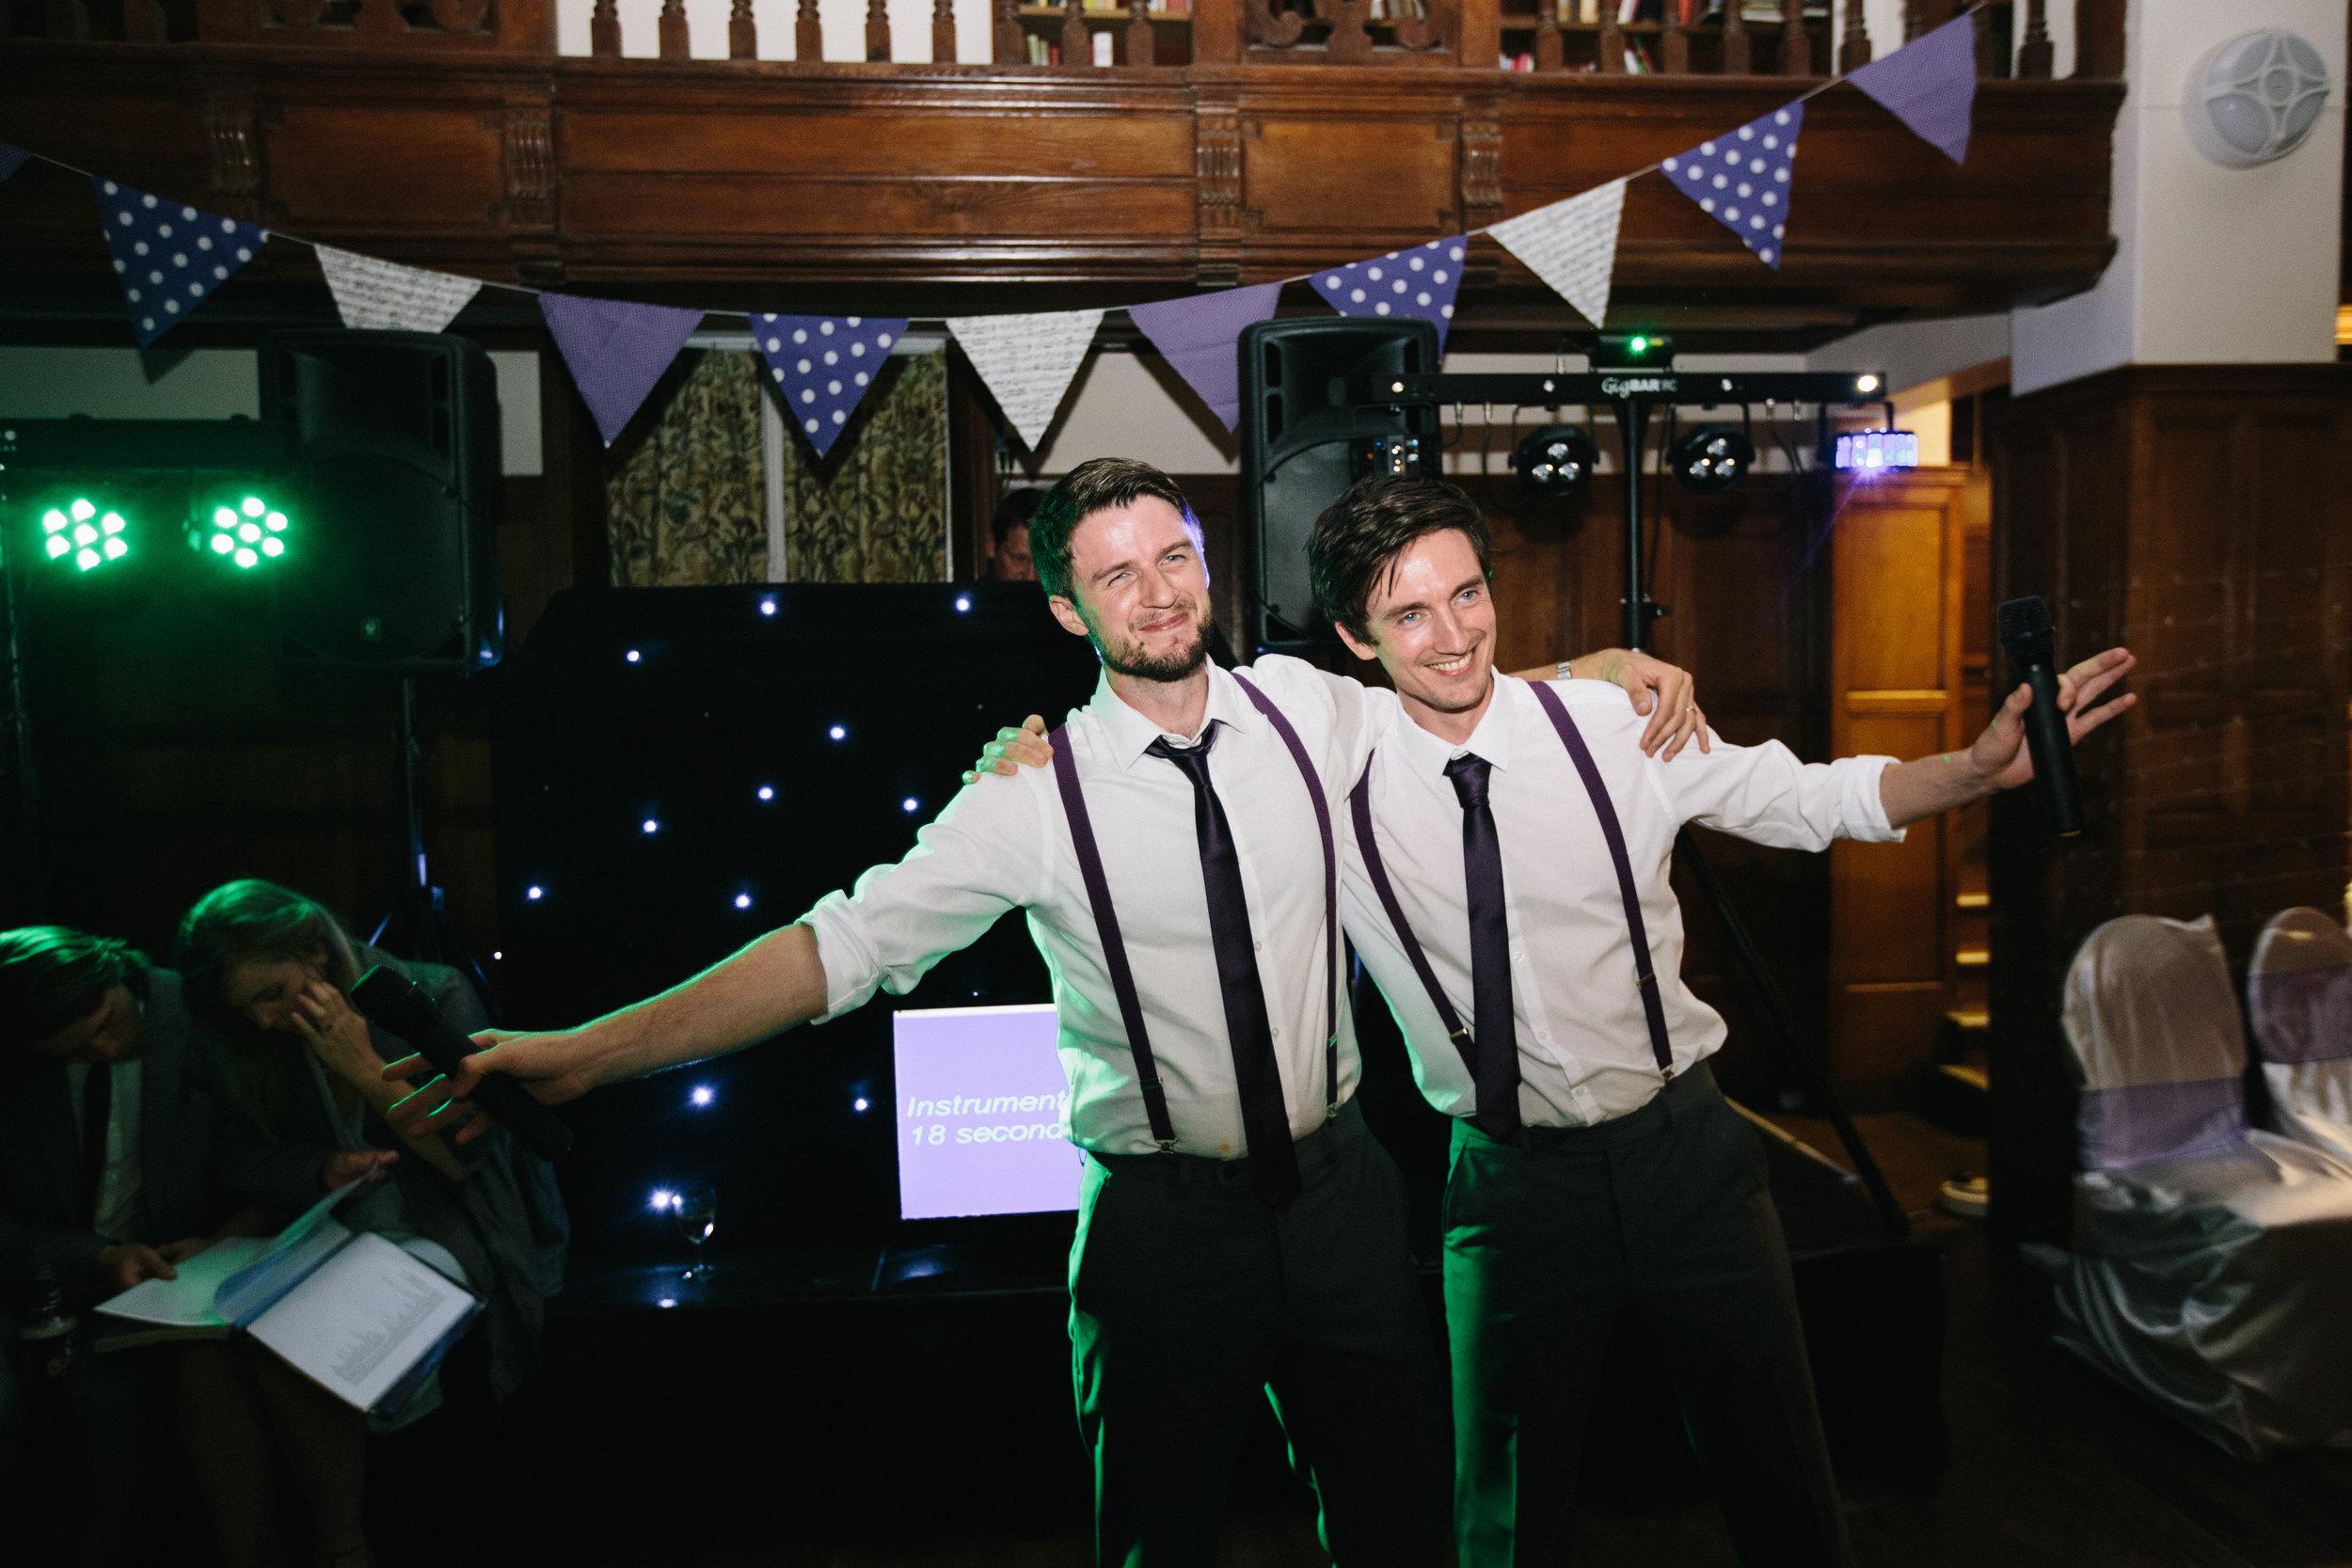 greenwich-charlton-house-london-wedding-karayoke-468